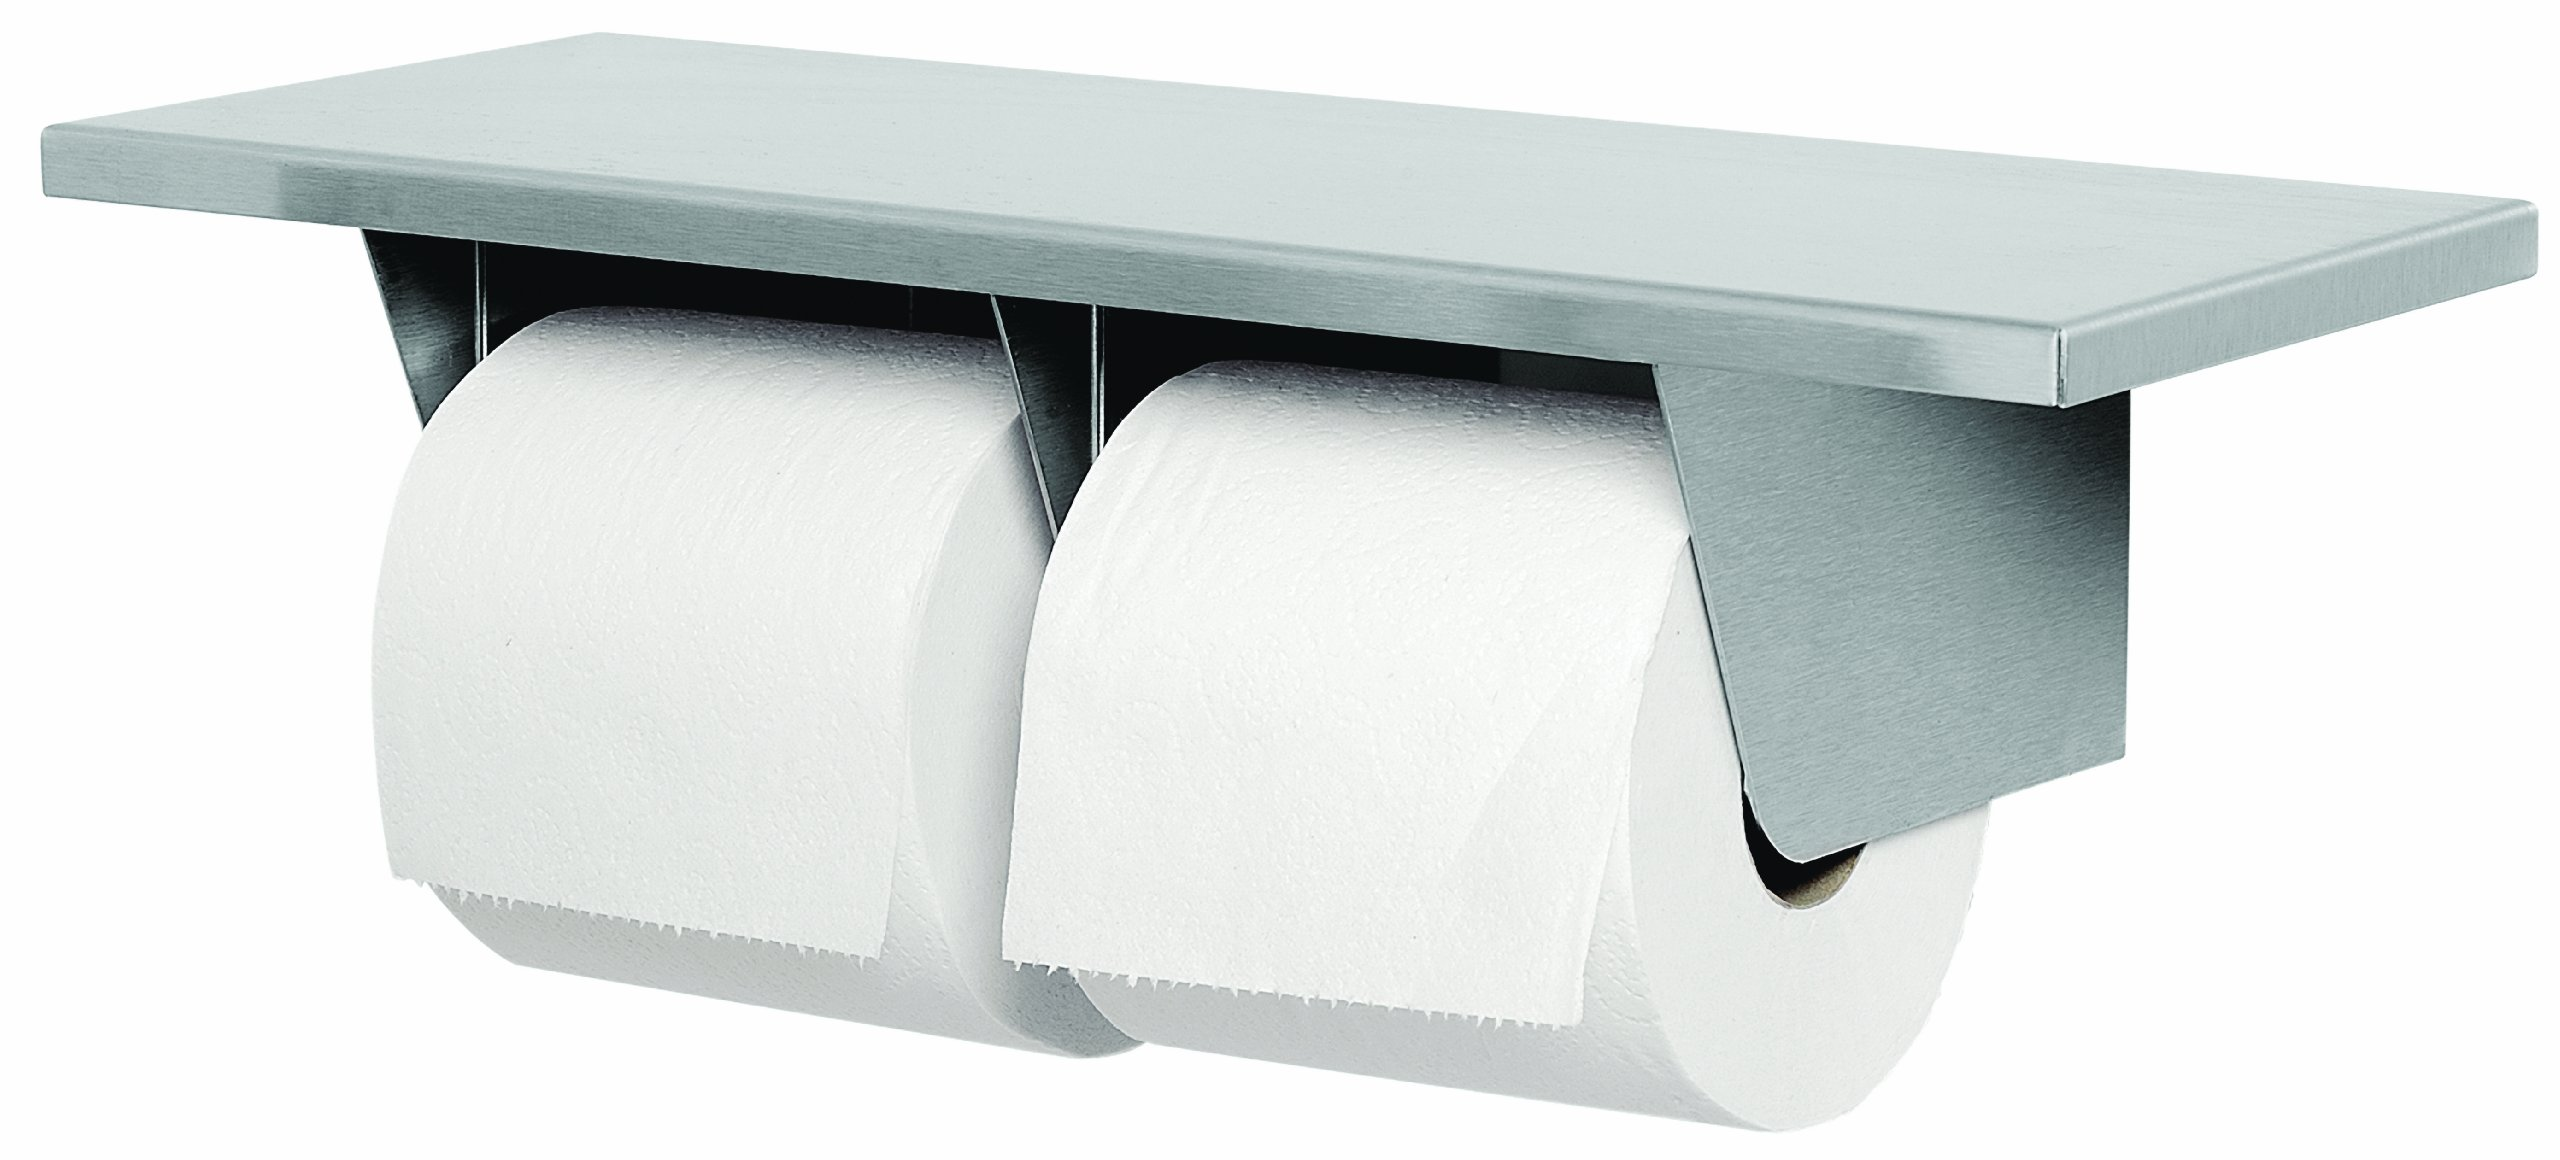 Bradley 5263-000000 Gauge Stainless Steel Toilet Tissue Dispenser with Shelf, 16'' Width x 3-15/16'' Height x 6'' Depth